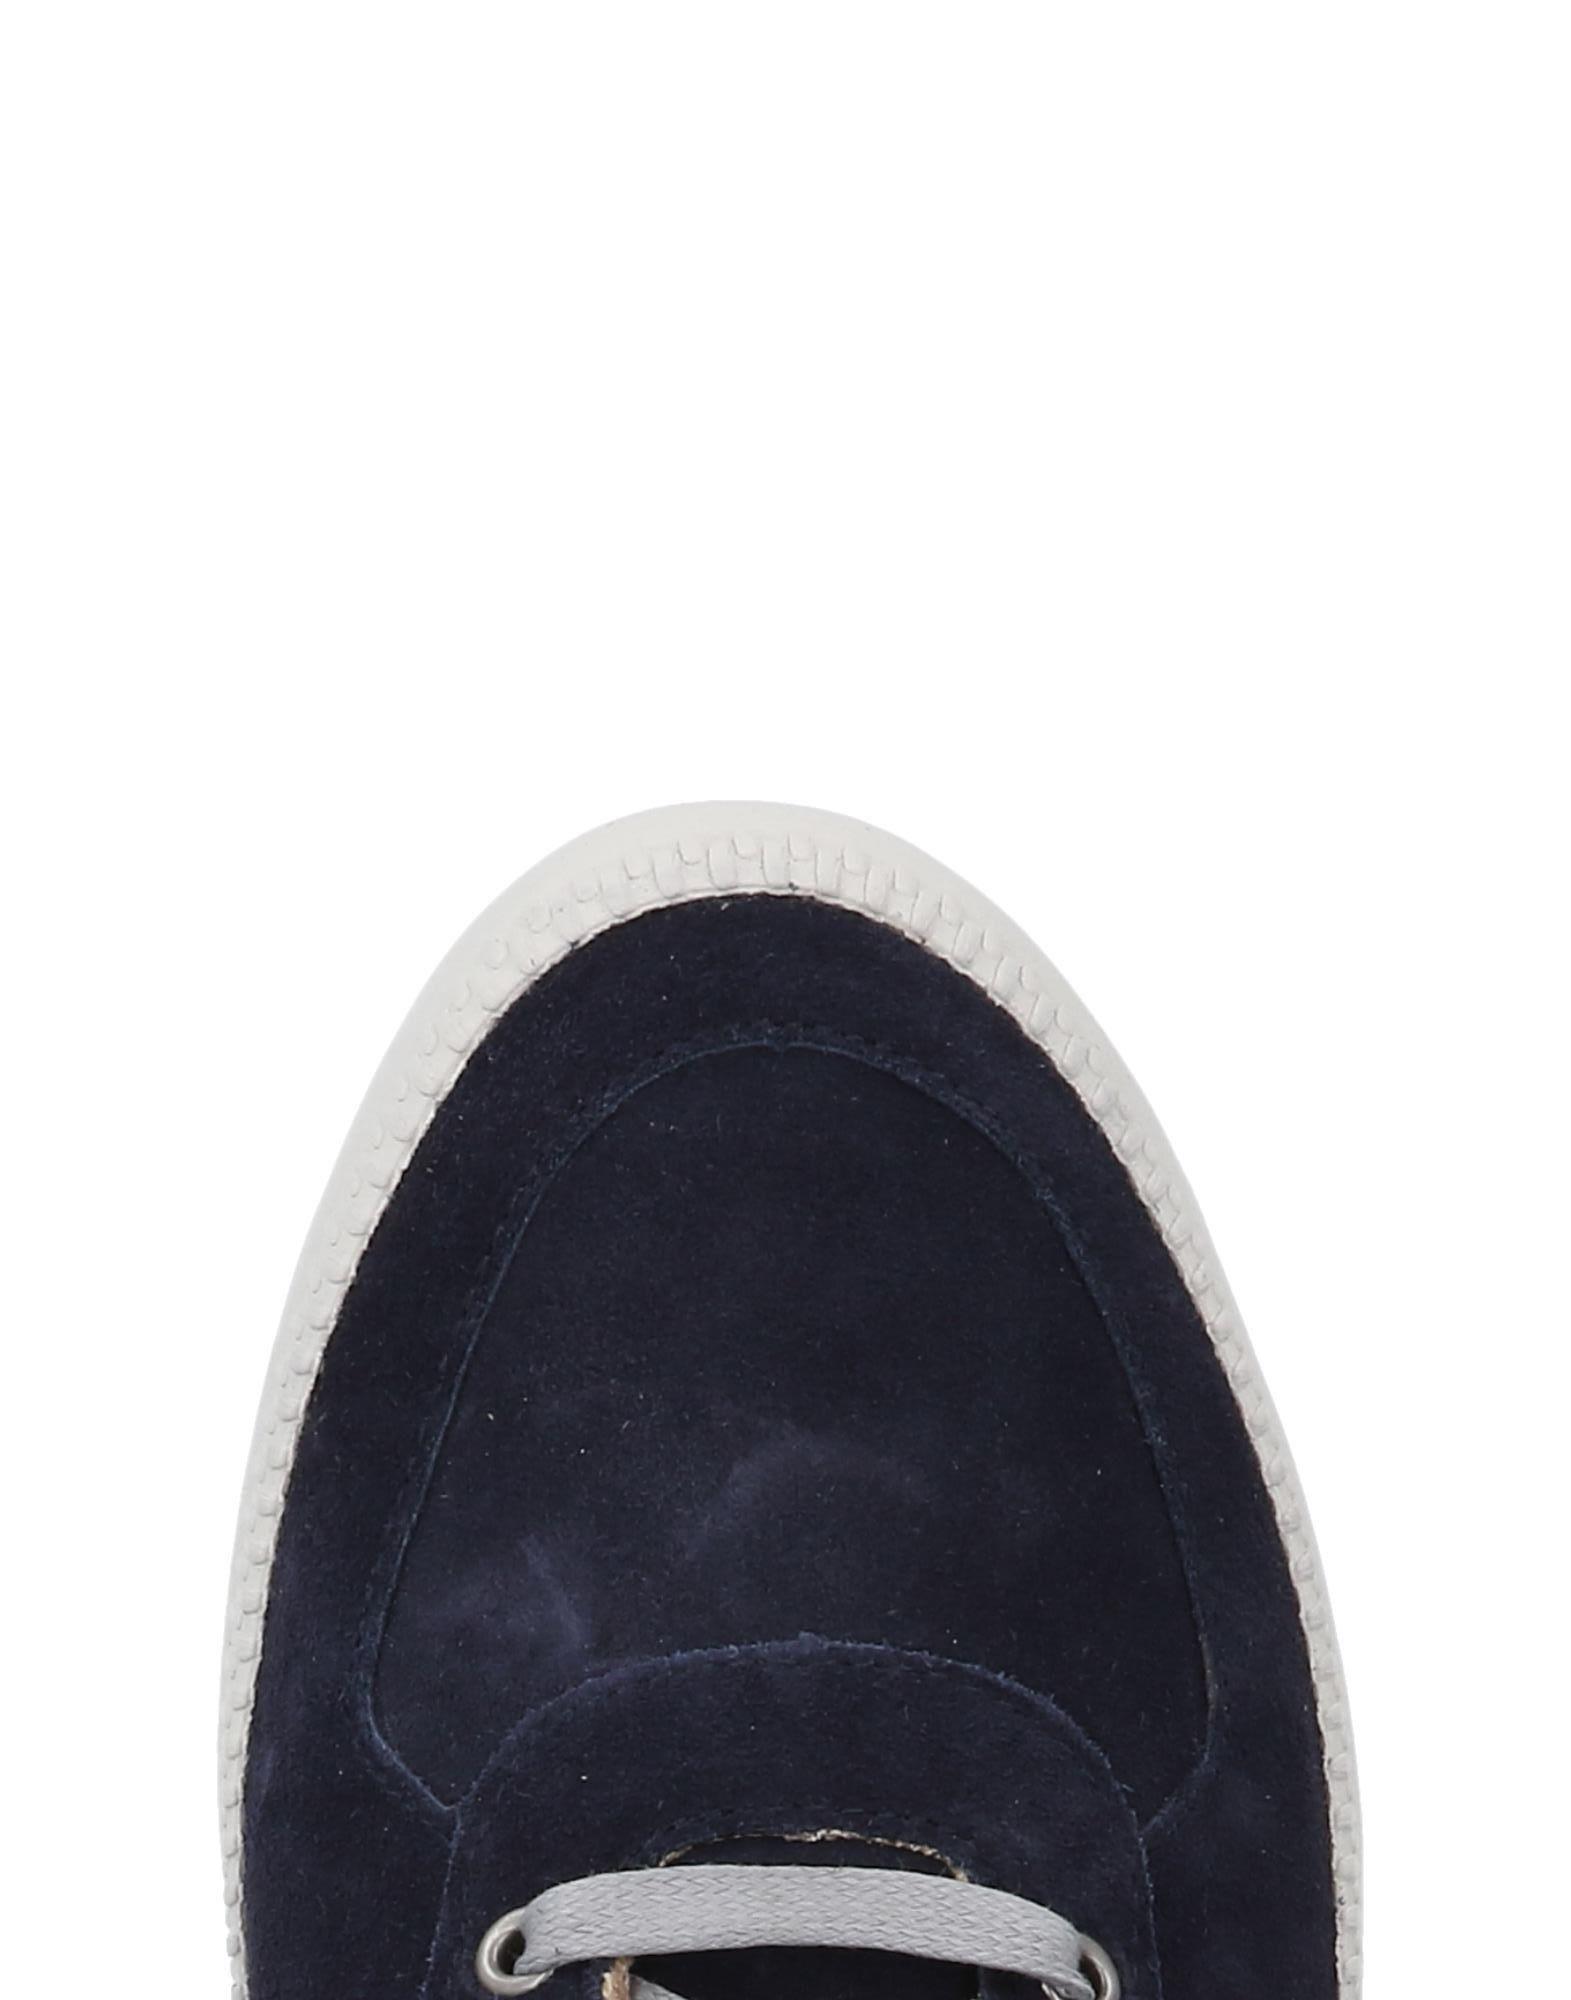 Rabatt echte Schuhe 11491061VS Diesel Sneakers Herren  11491061VS Schuhe 177e99